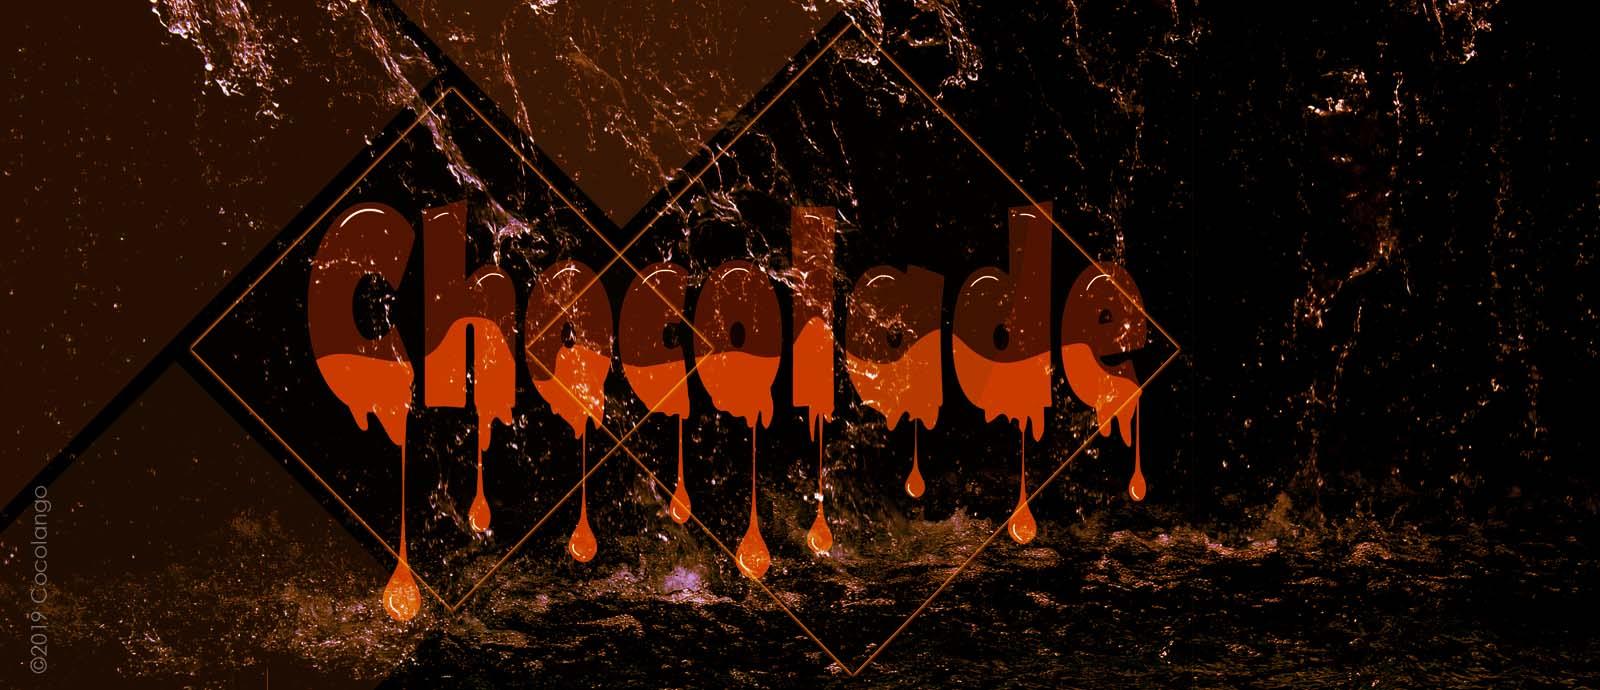 Grafikdesign l Webdesign l Cocolango